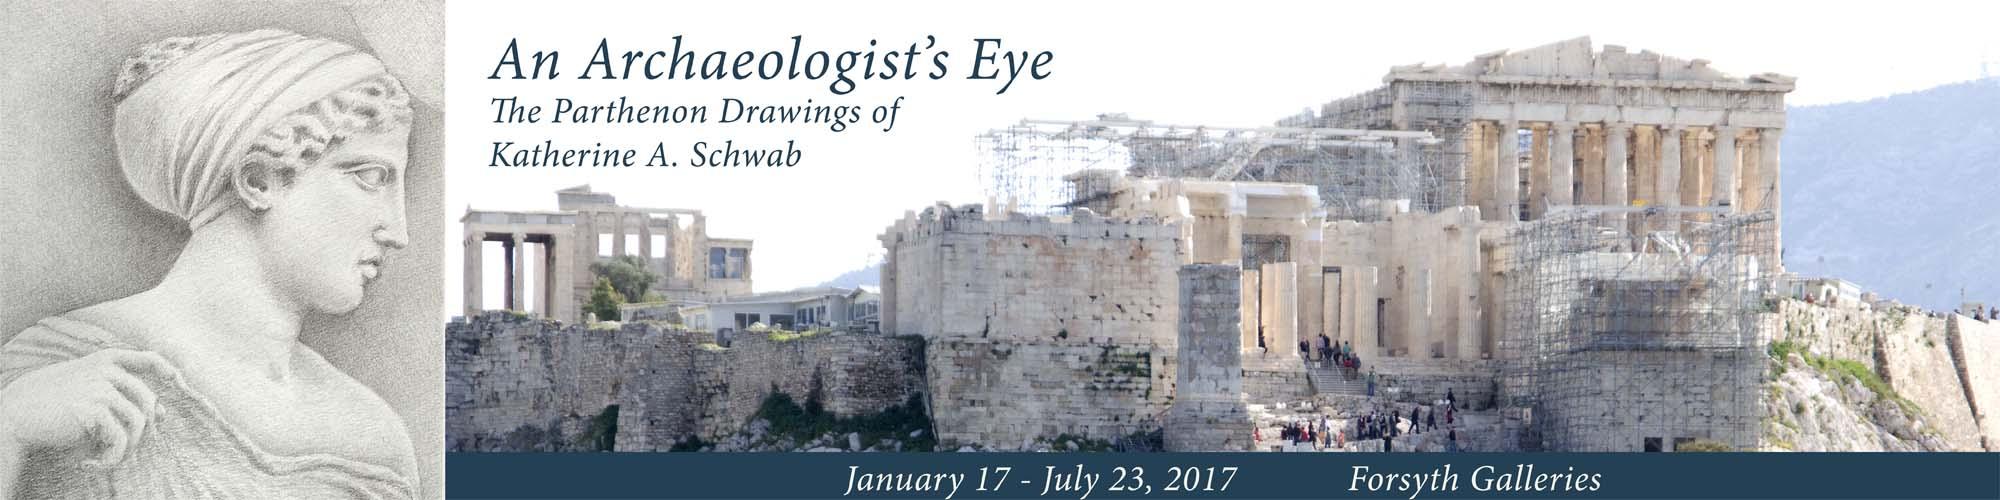 Arch Eye web banner 5